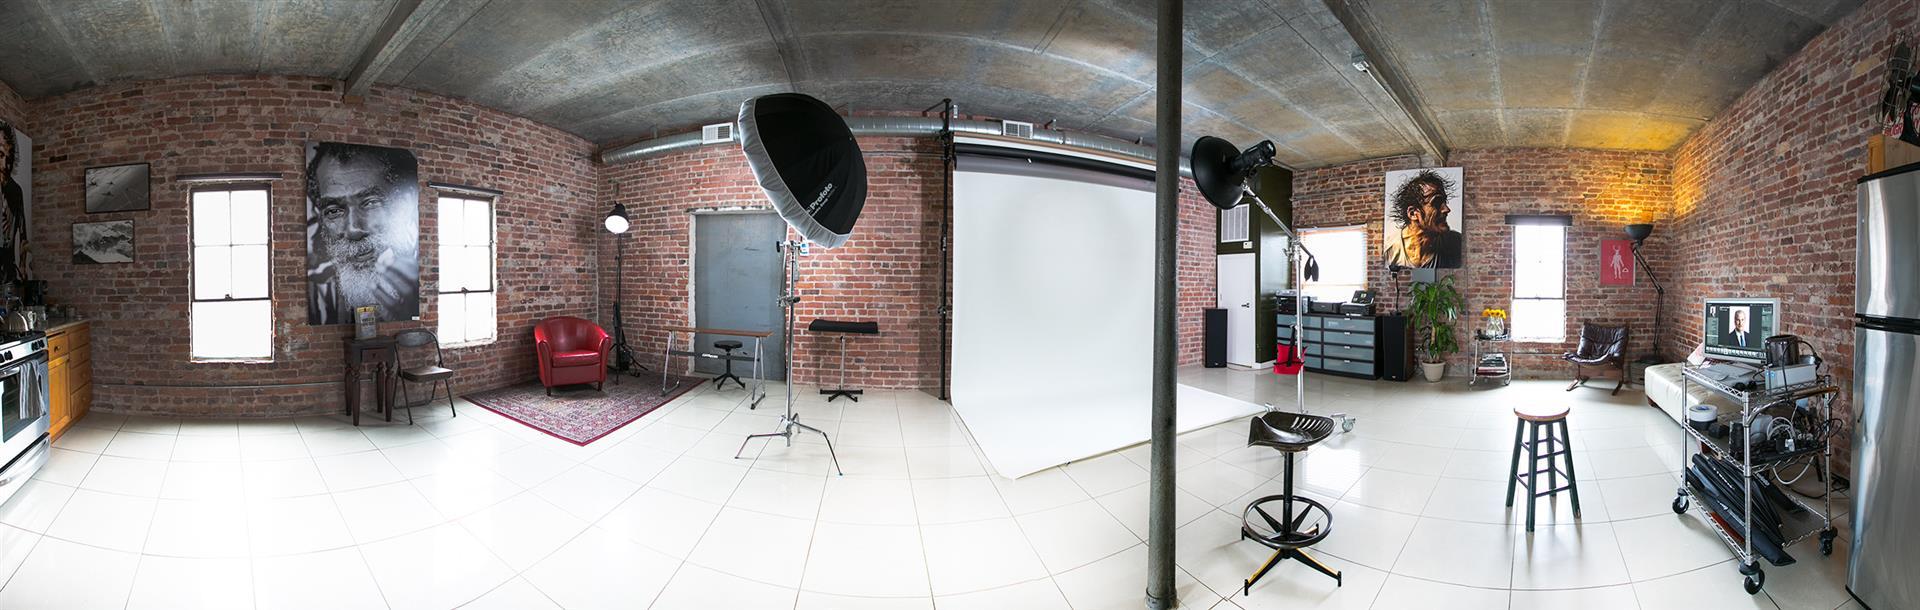 Foto Kallweit Studio and Event Space - Foto Kallweit Studio